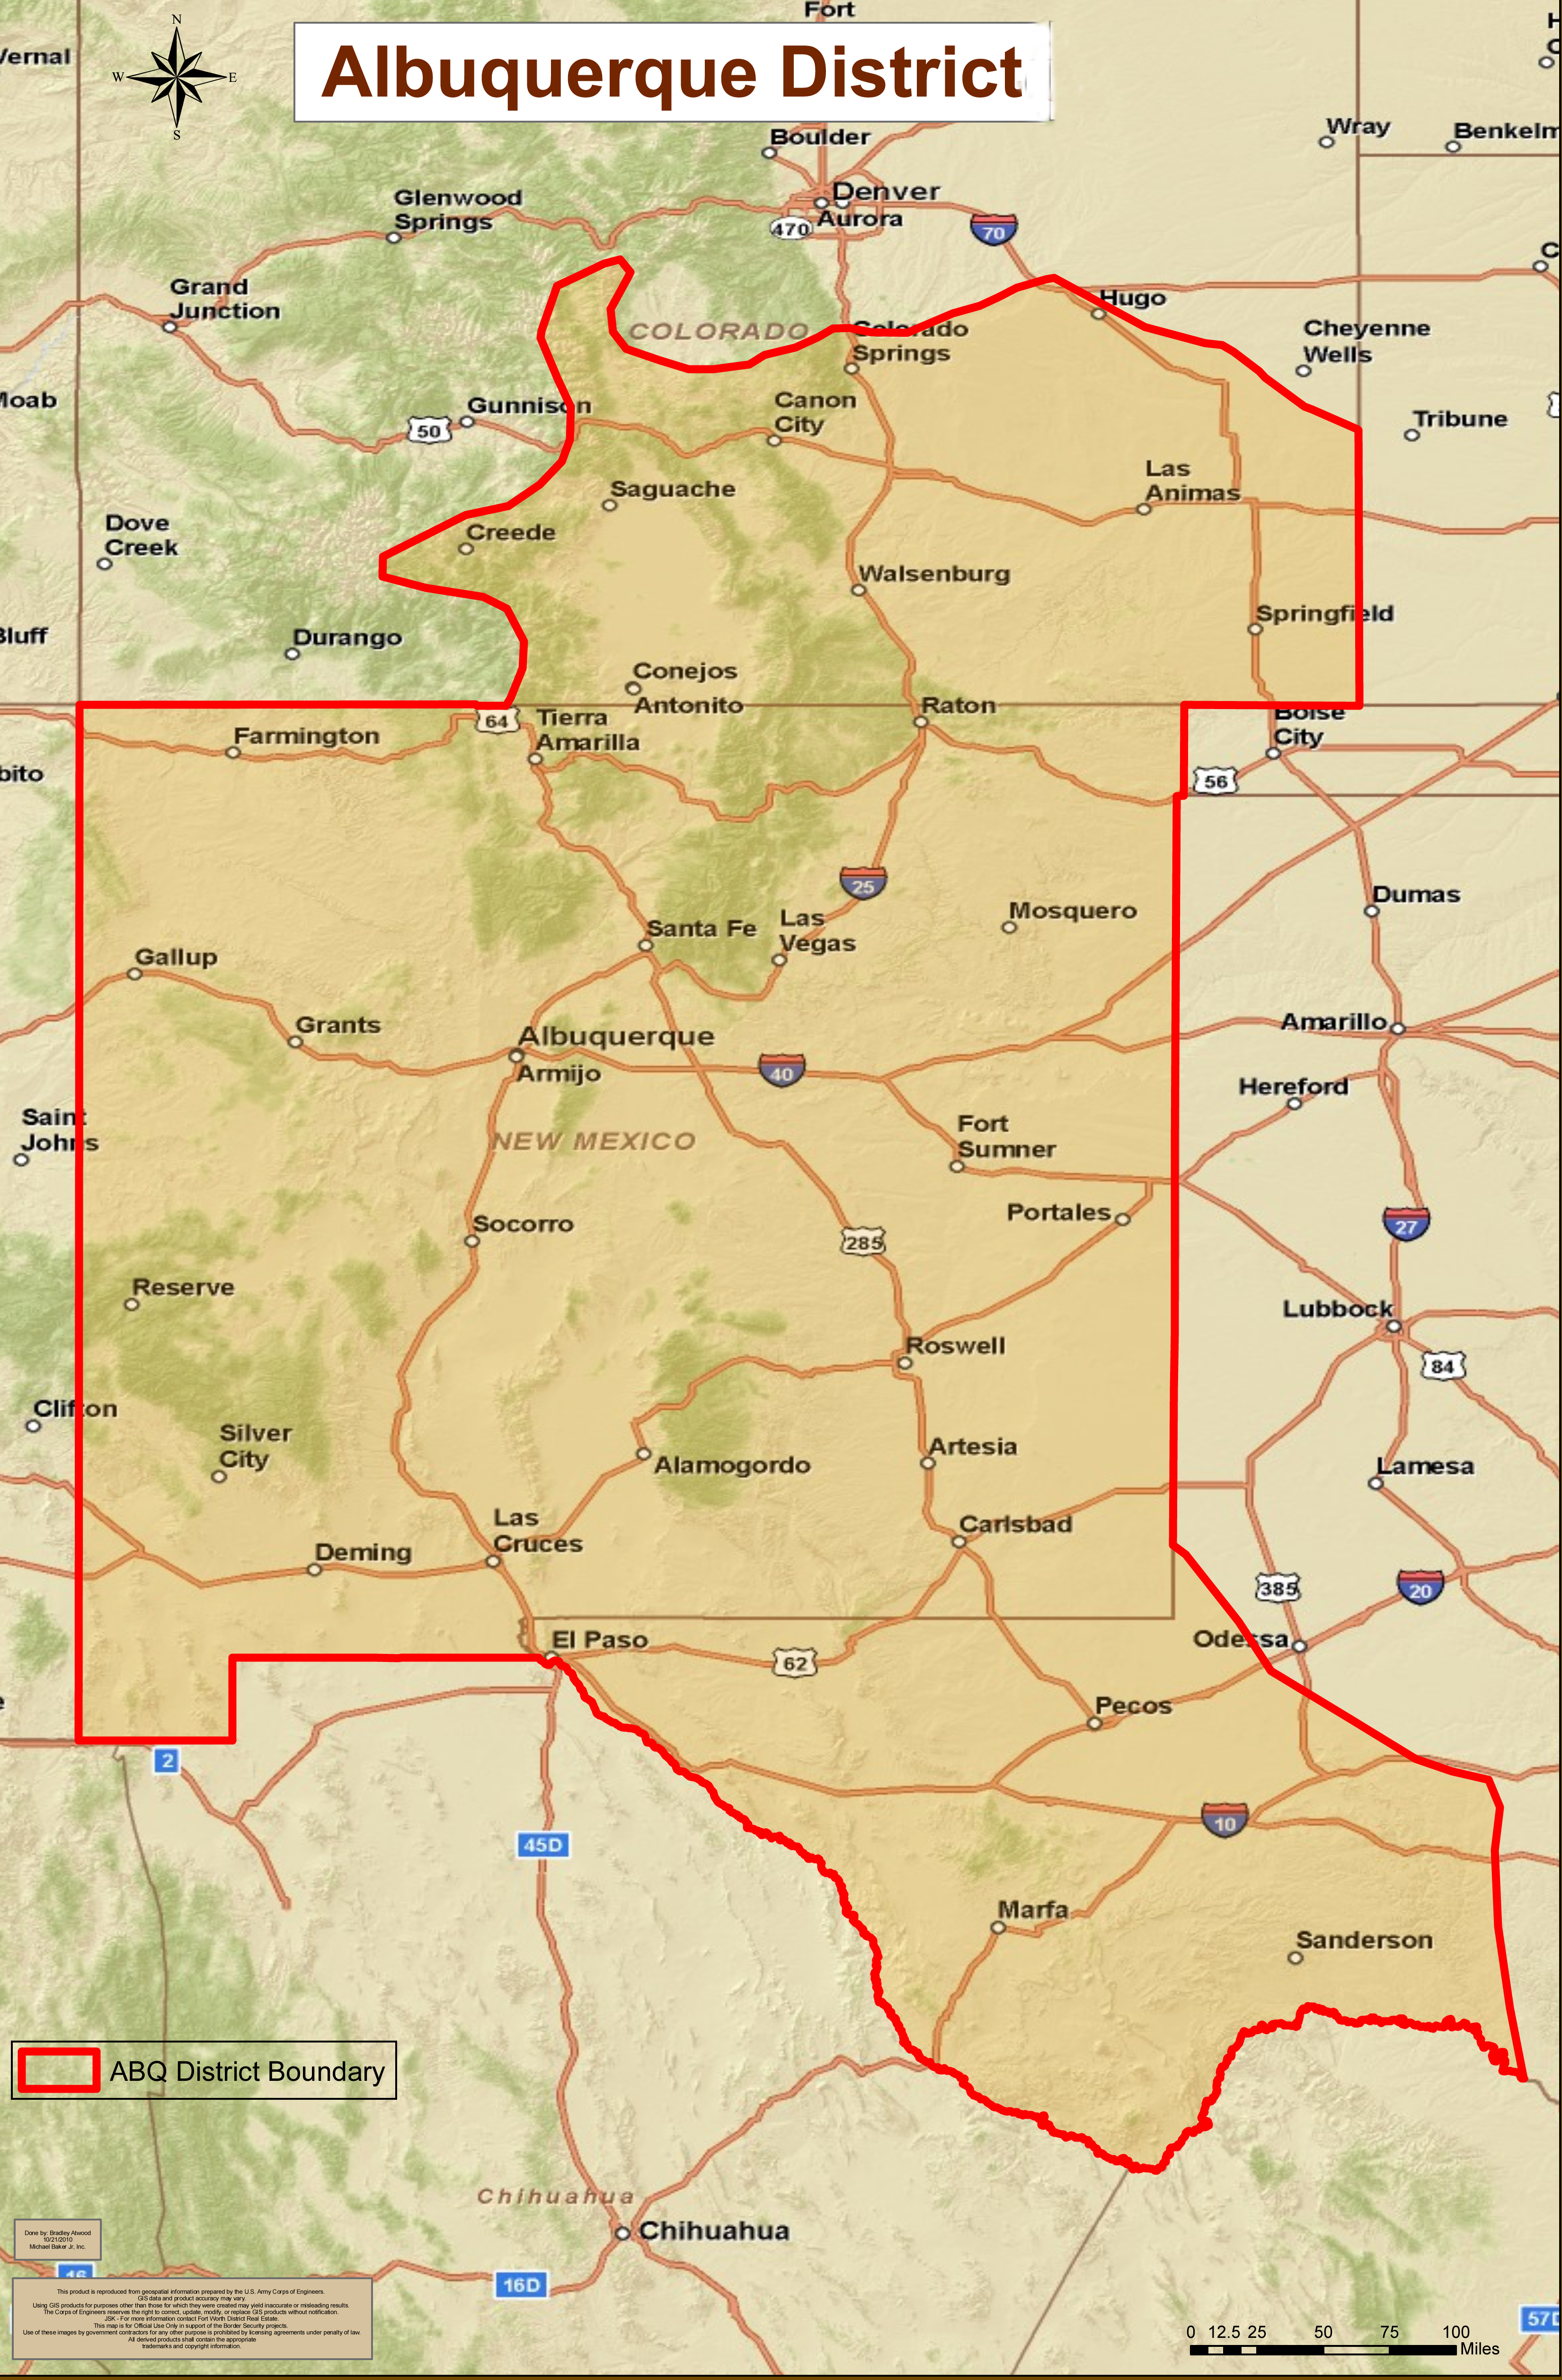 Albuquerque District Maps on albuquerque parks map, albuquerque area zip code map, albuquerque international sunport map, sunset map, albuquerque new mexico map, old town albuquerque map, downtown albuquerque map, albuquerque city map, albuquerque bike map, albuquerque neighborhood map, abc map, albq map, albuquerque academy map, albuquerque county map, albuquerque airport map, fat map, jan map, end times map, albuquerque new home location map, san map,